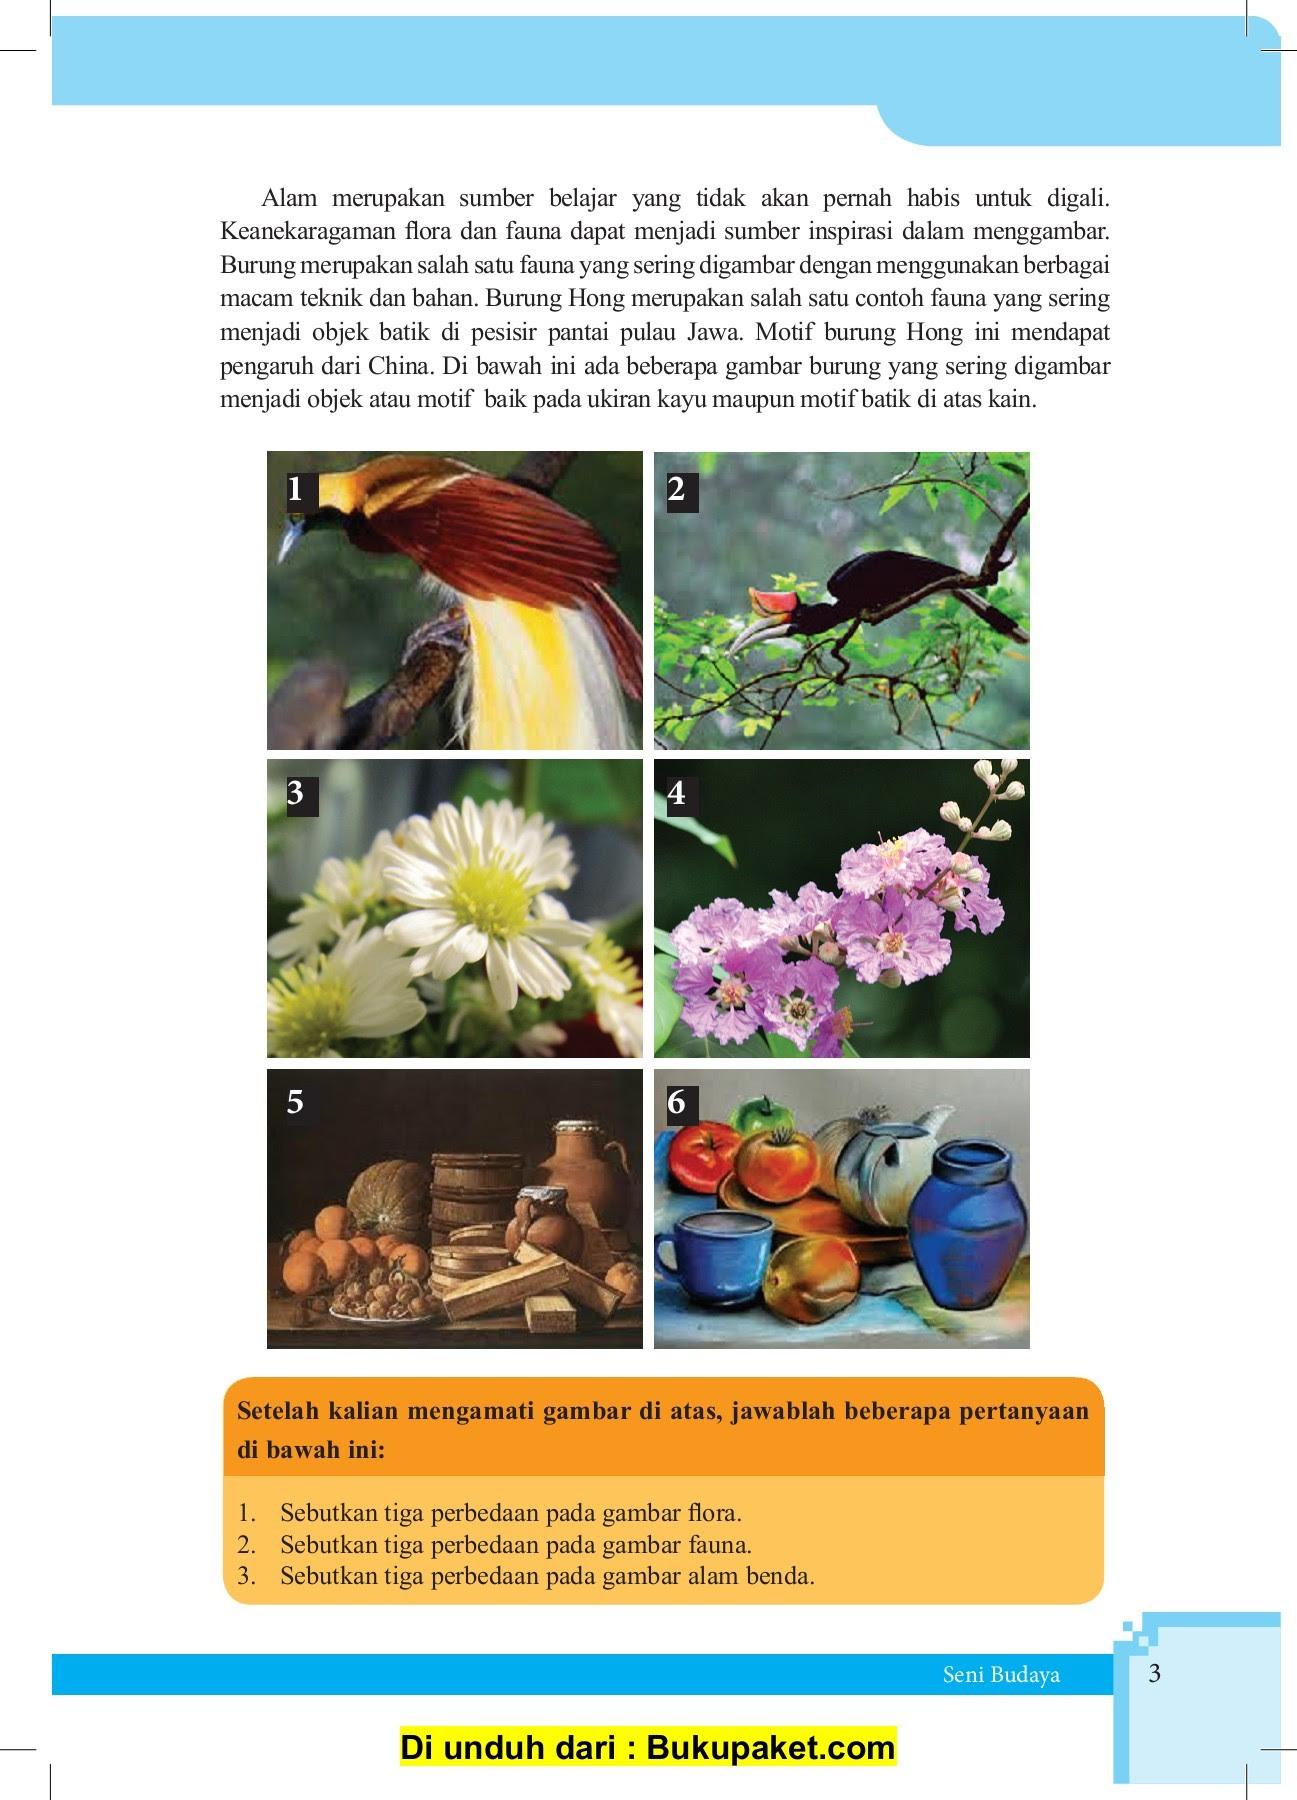 80+ Gambar Sketsa Flora Fauna Paling Bagus